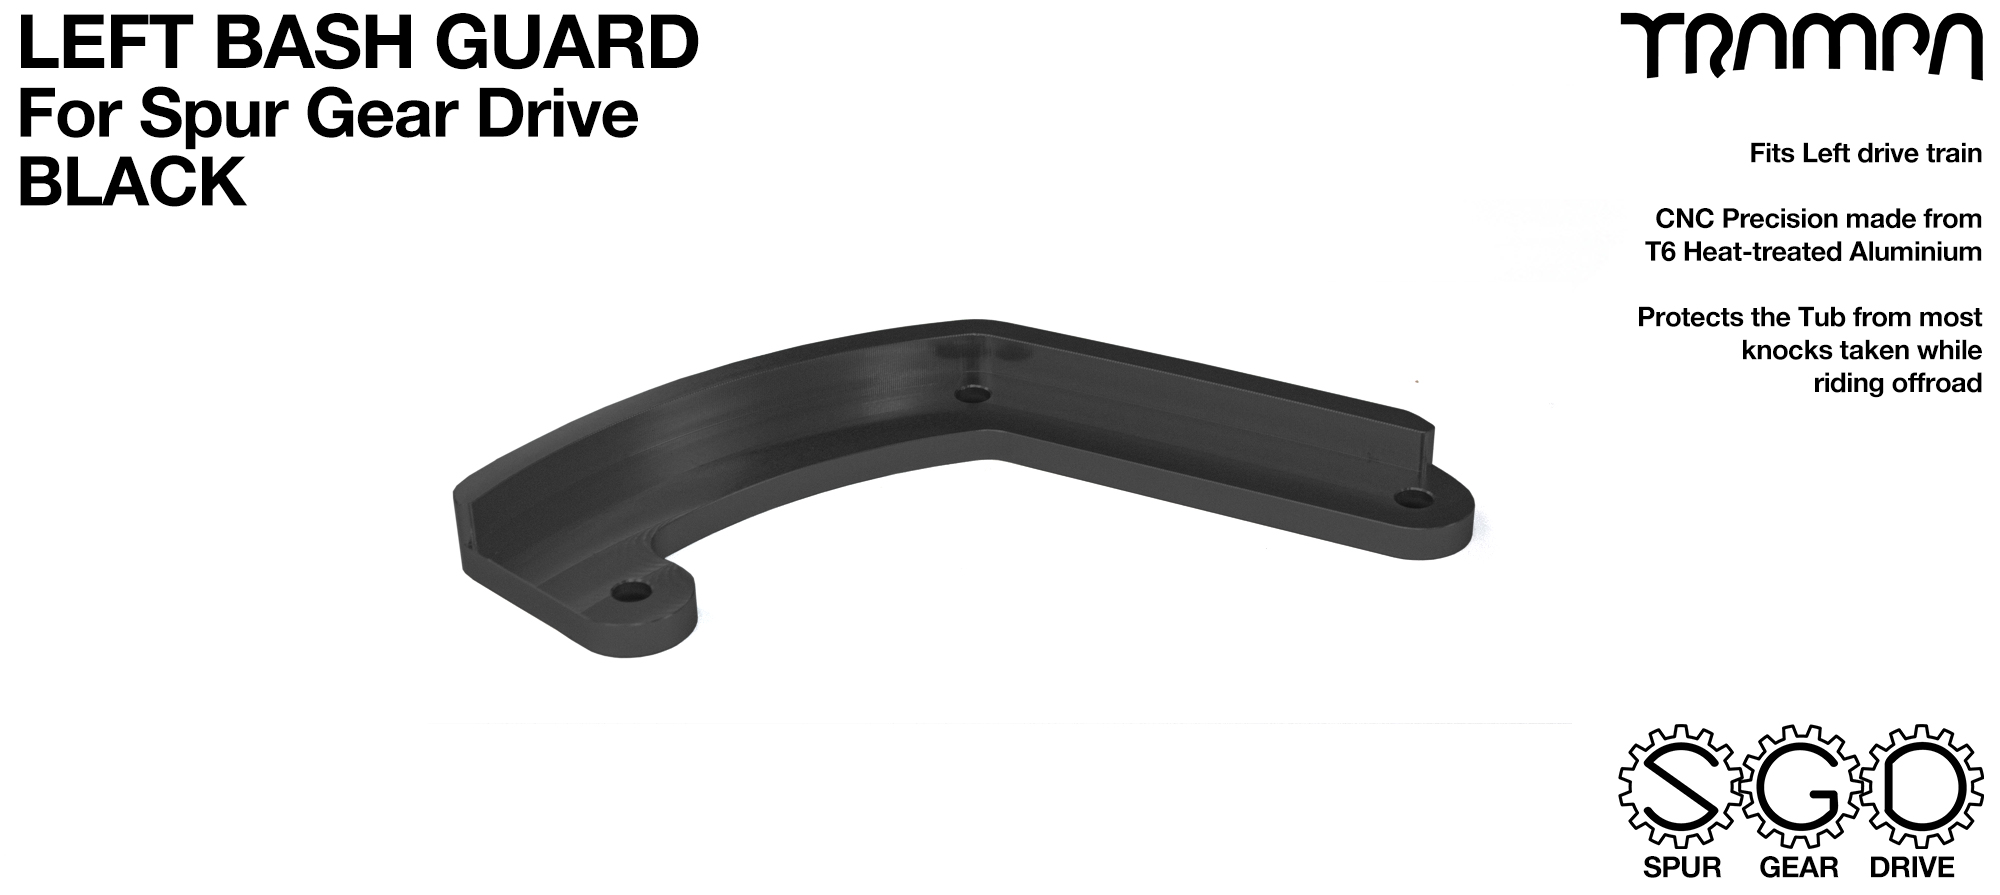 SPUR Gear Drive Bash Guard - LEFT Side - BLACK